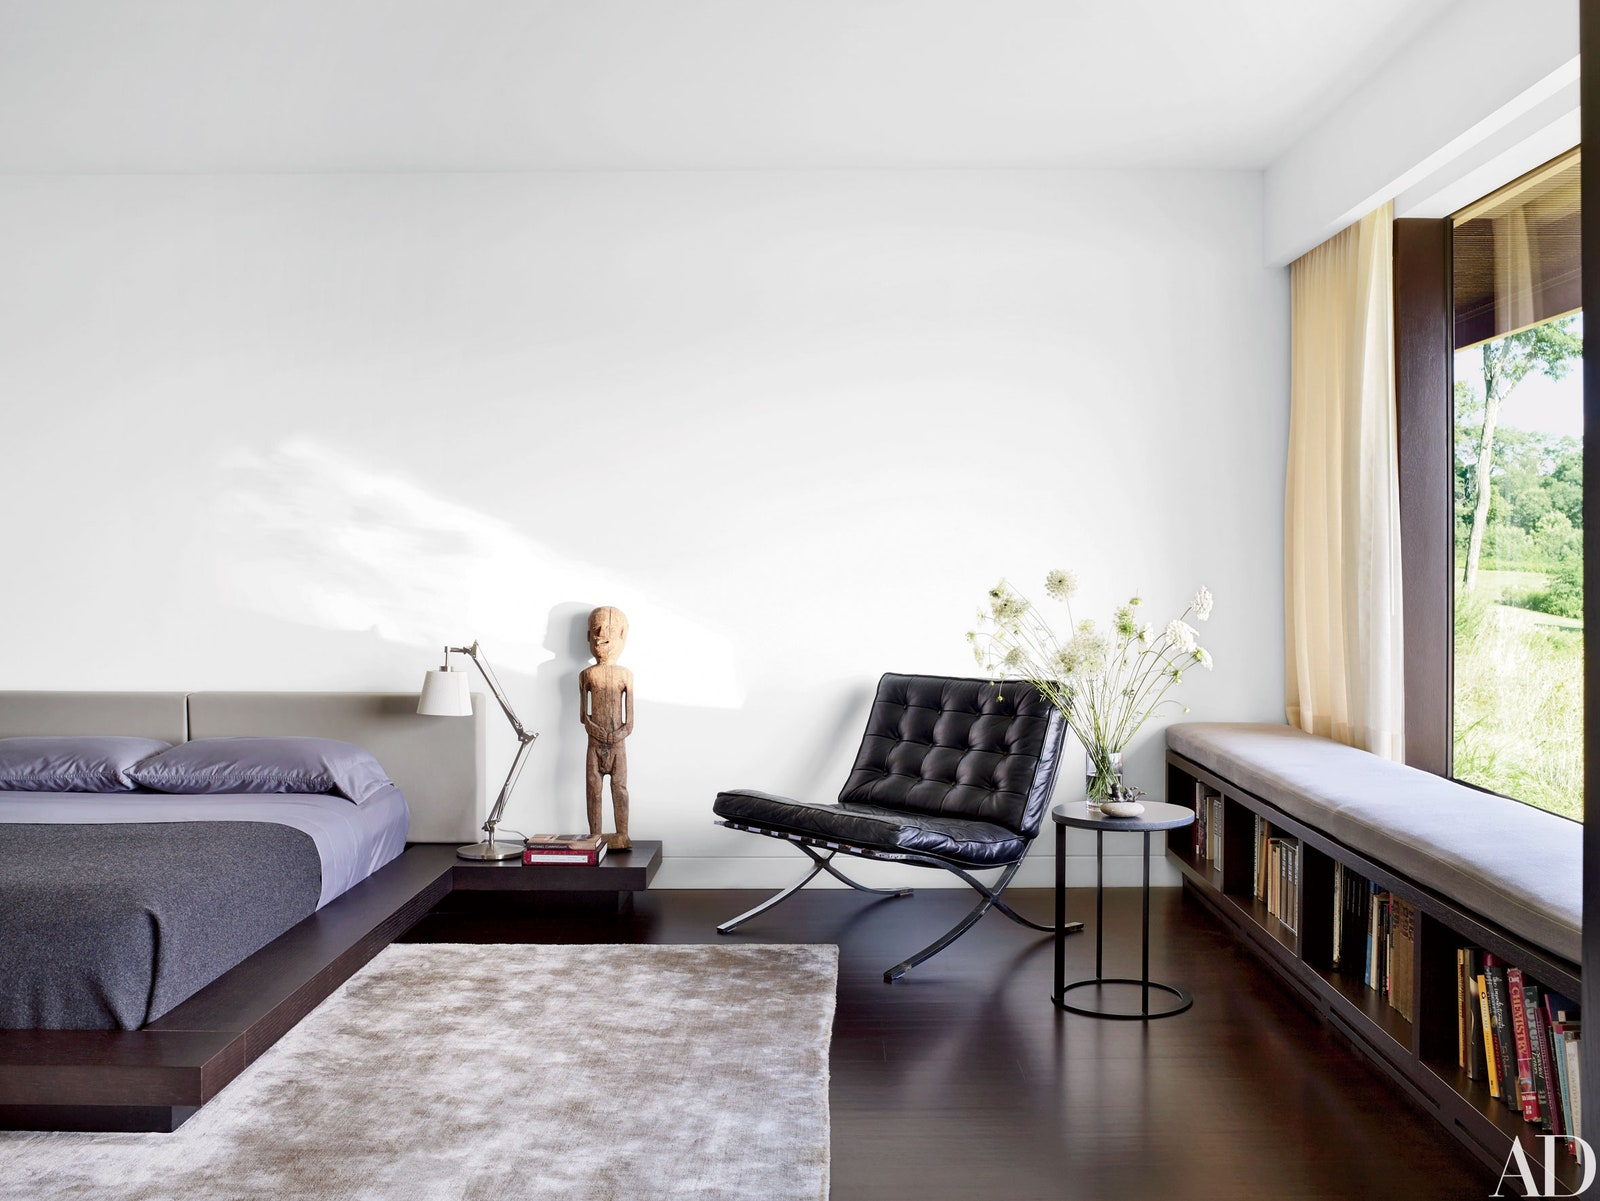 Inspirasi area duduk pada kamar tamu - source: architecturaldigest.com